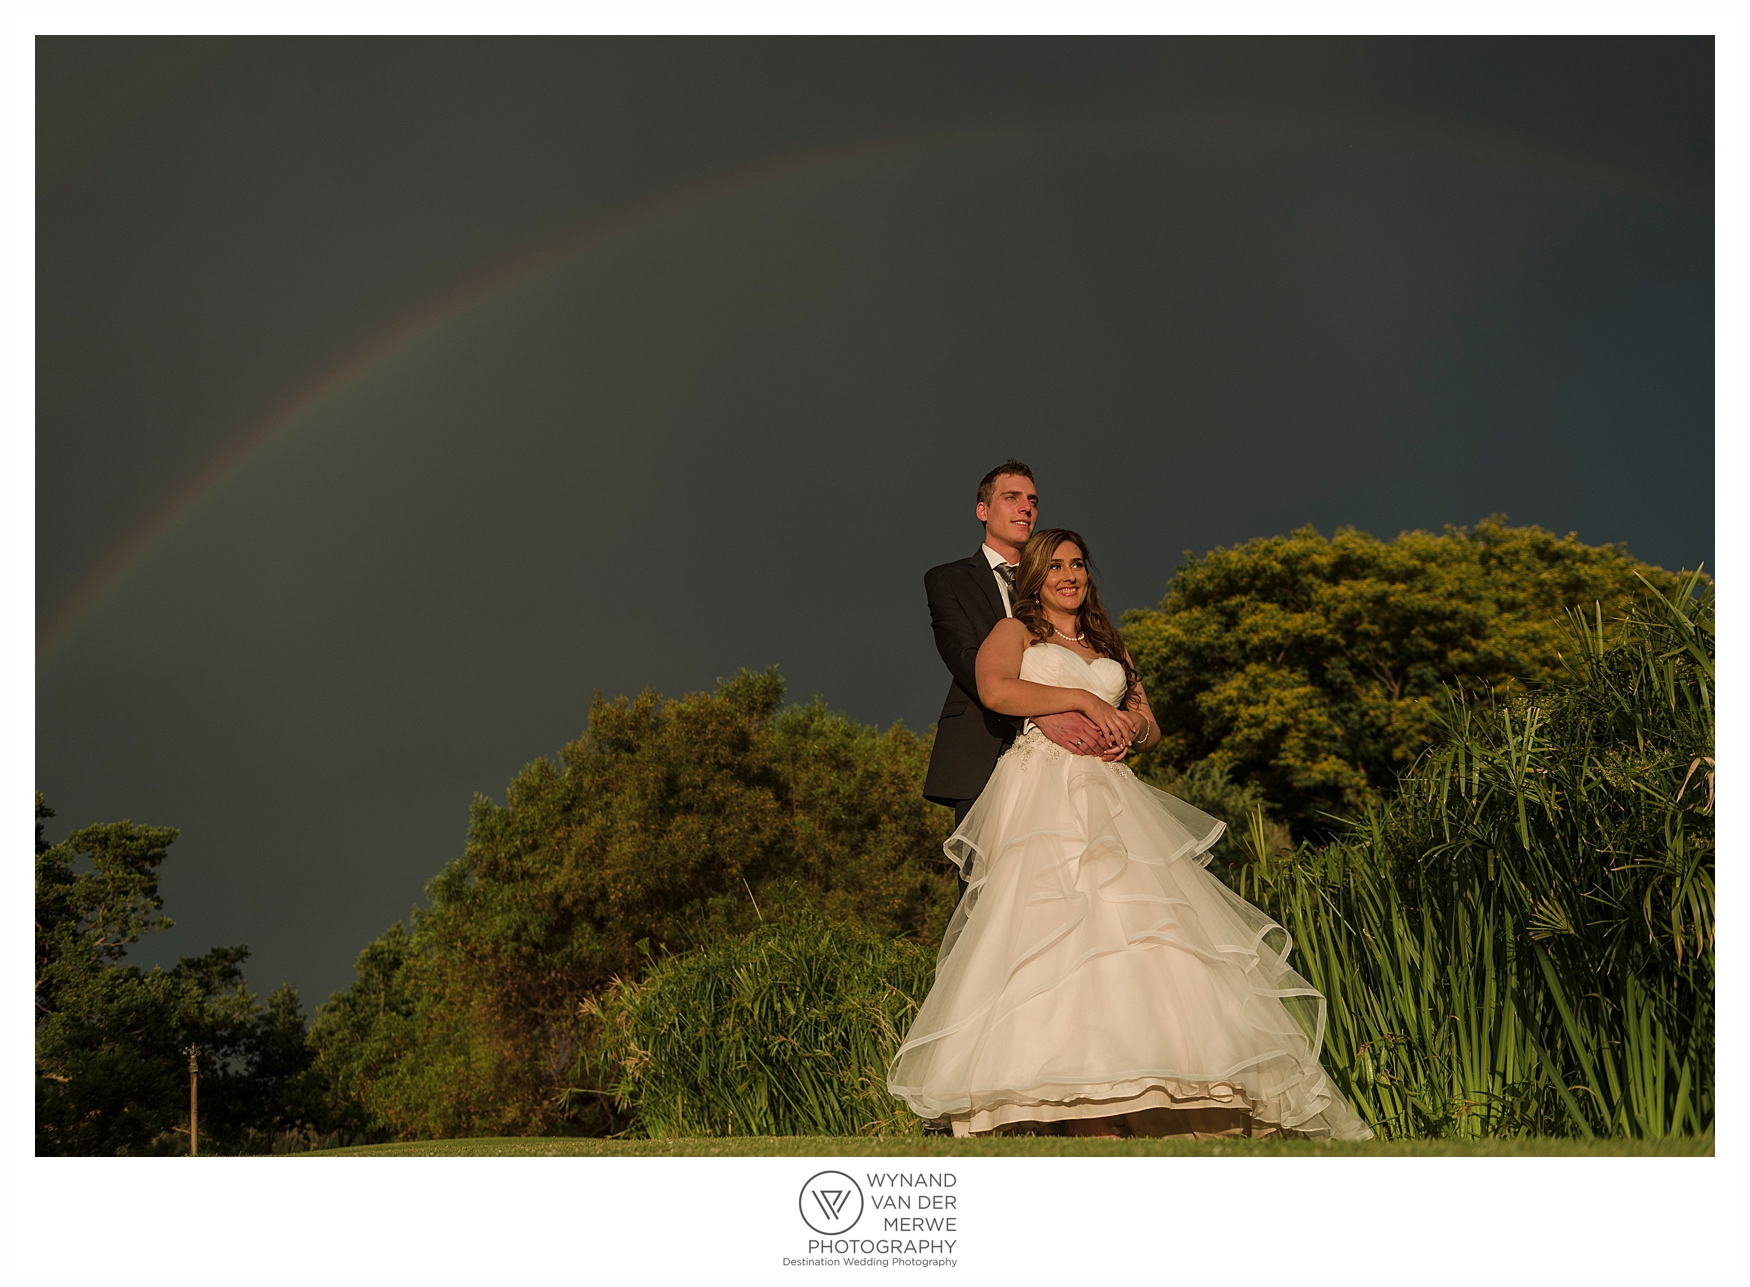 Wynandvandermerwe ryan natalia wedding photography cradle valley guesthouse gauteng-479.jpg